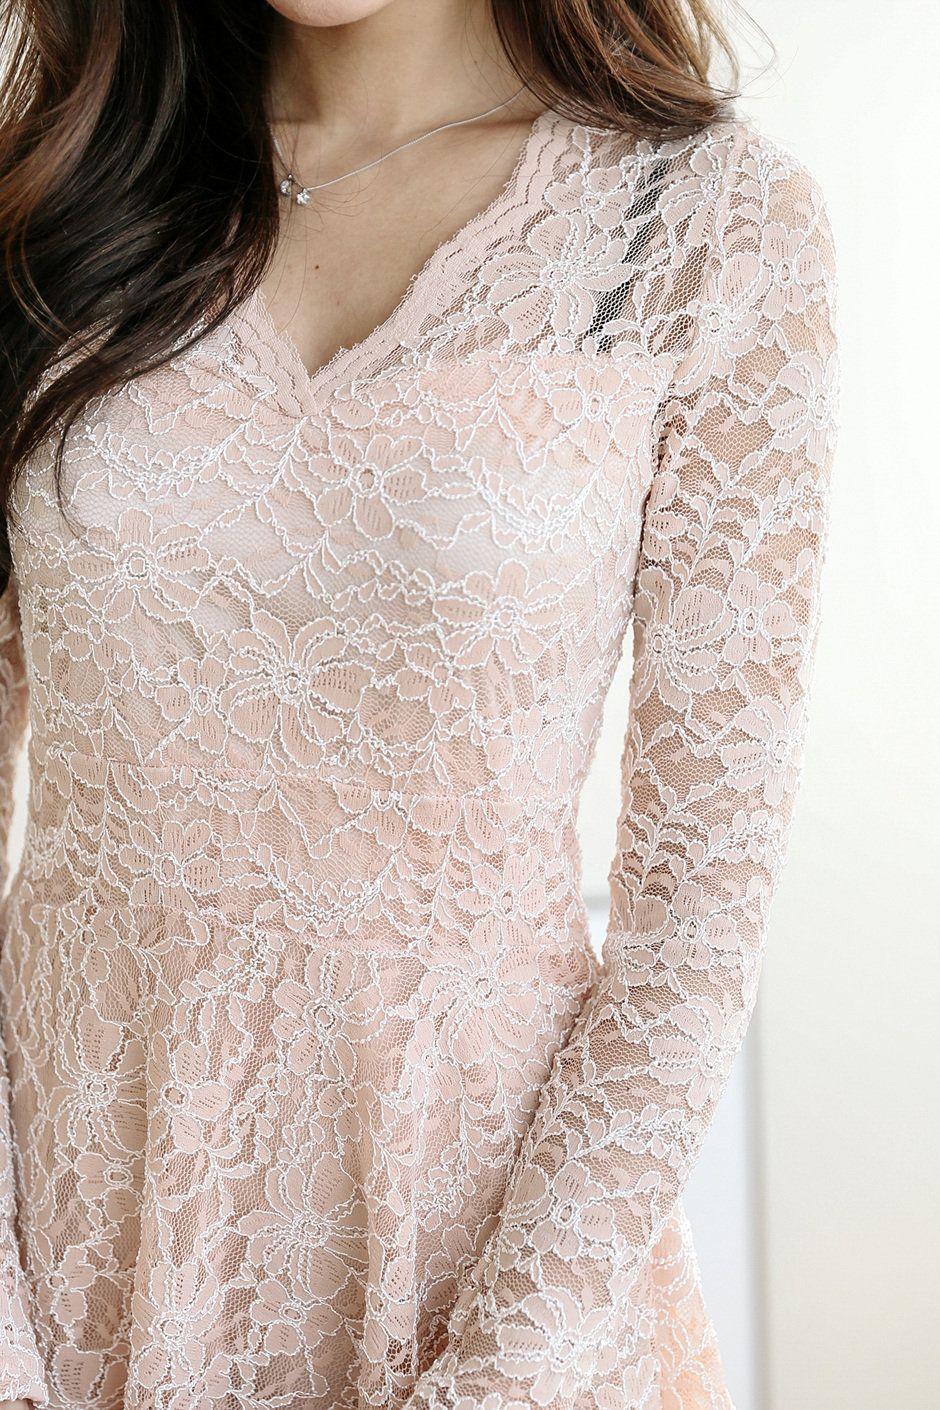 Lace dress in black august 2019 Wave Lace V Dress  Dress in   Pinterest  Dresses V dress and